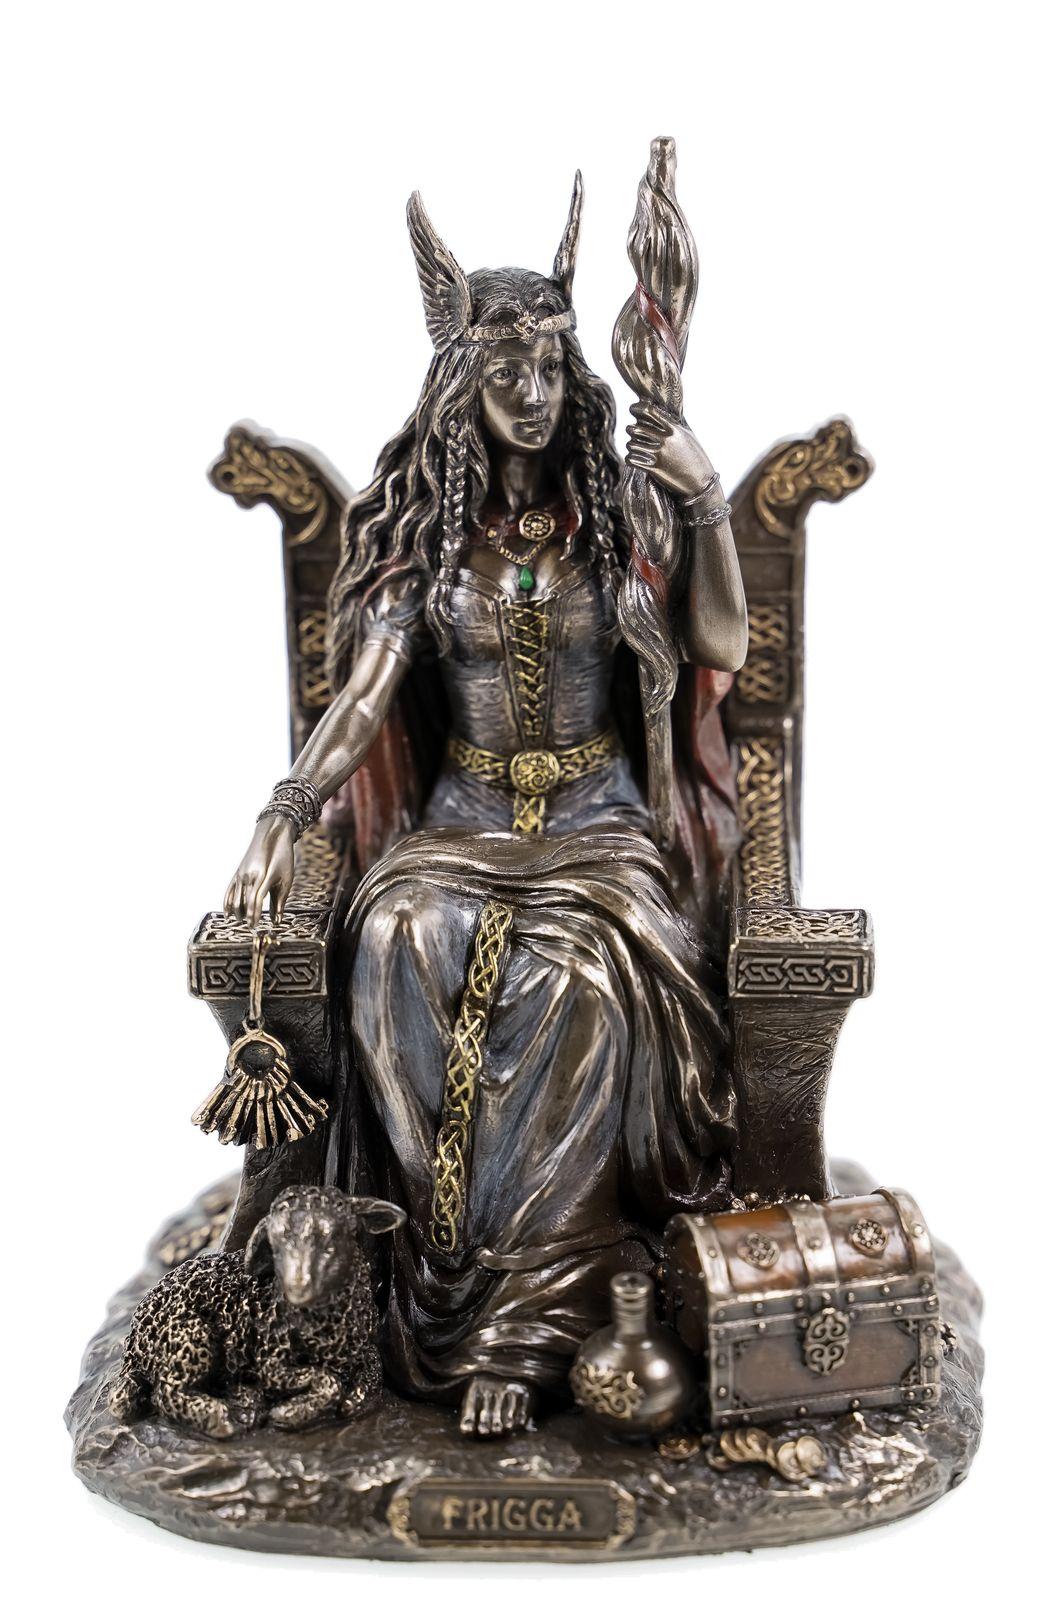 Germanische Göttin Frigga Frau Odins auf Thron Frigg Odin